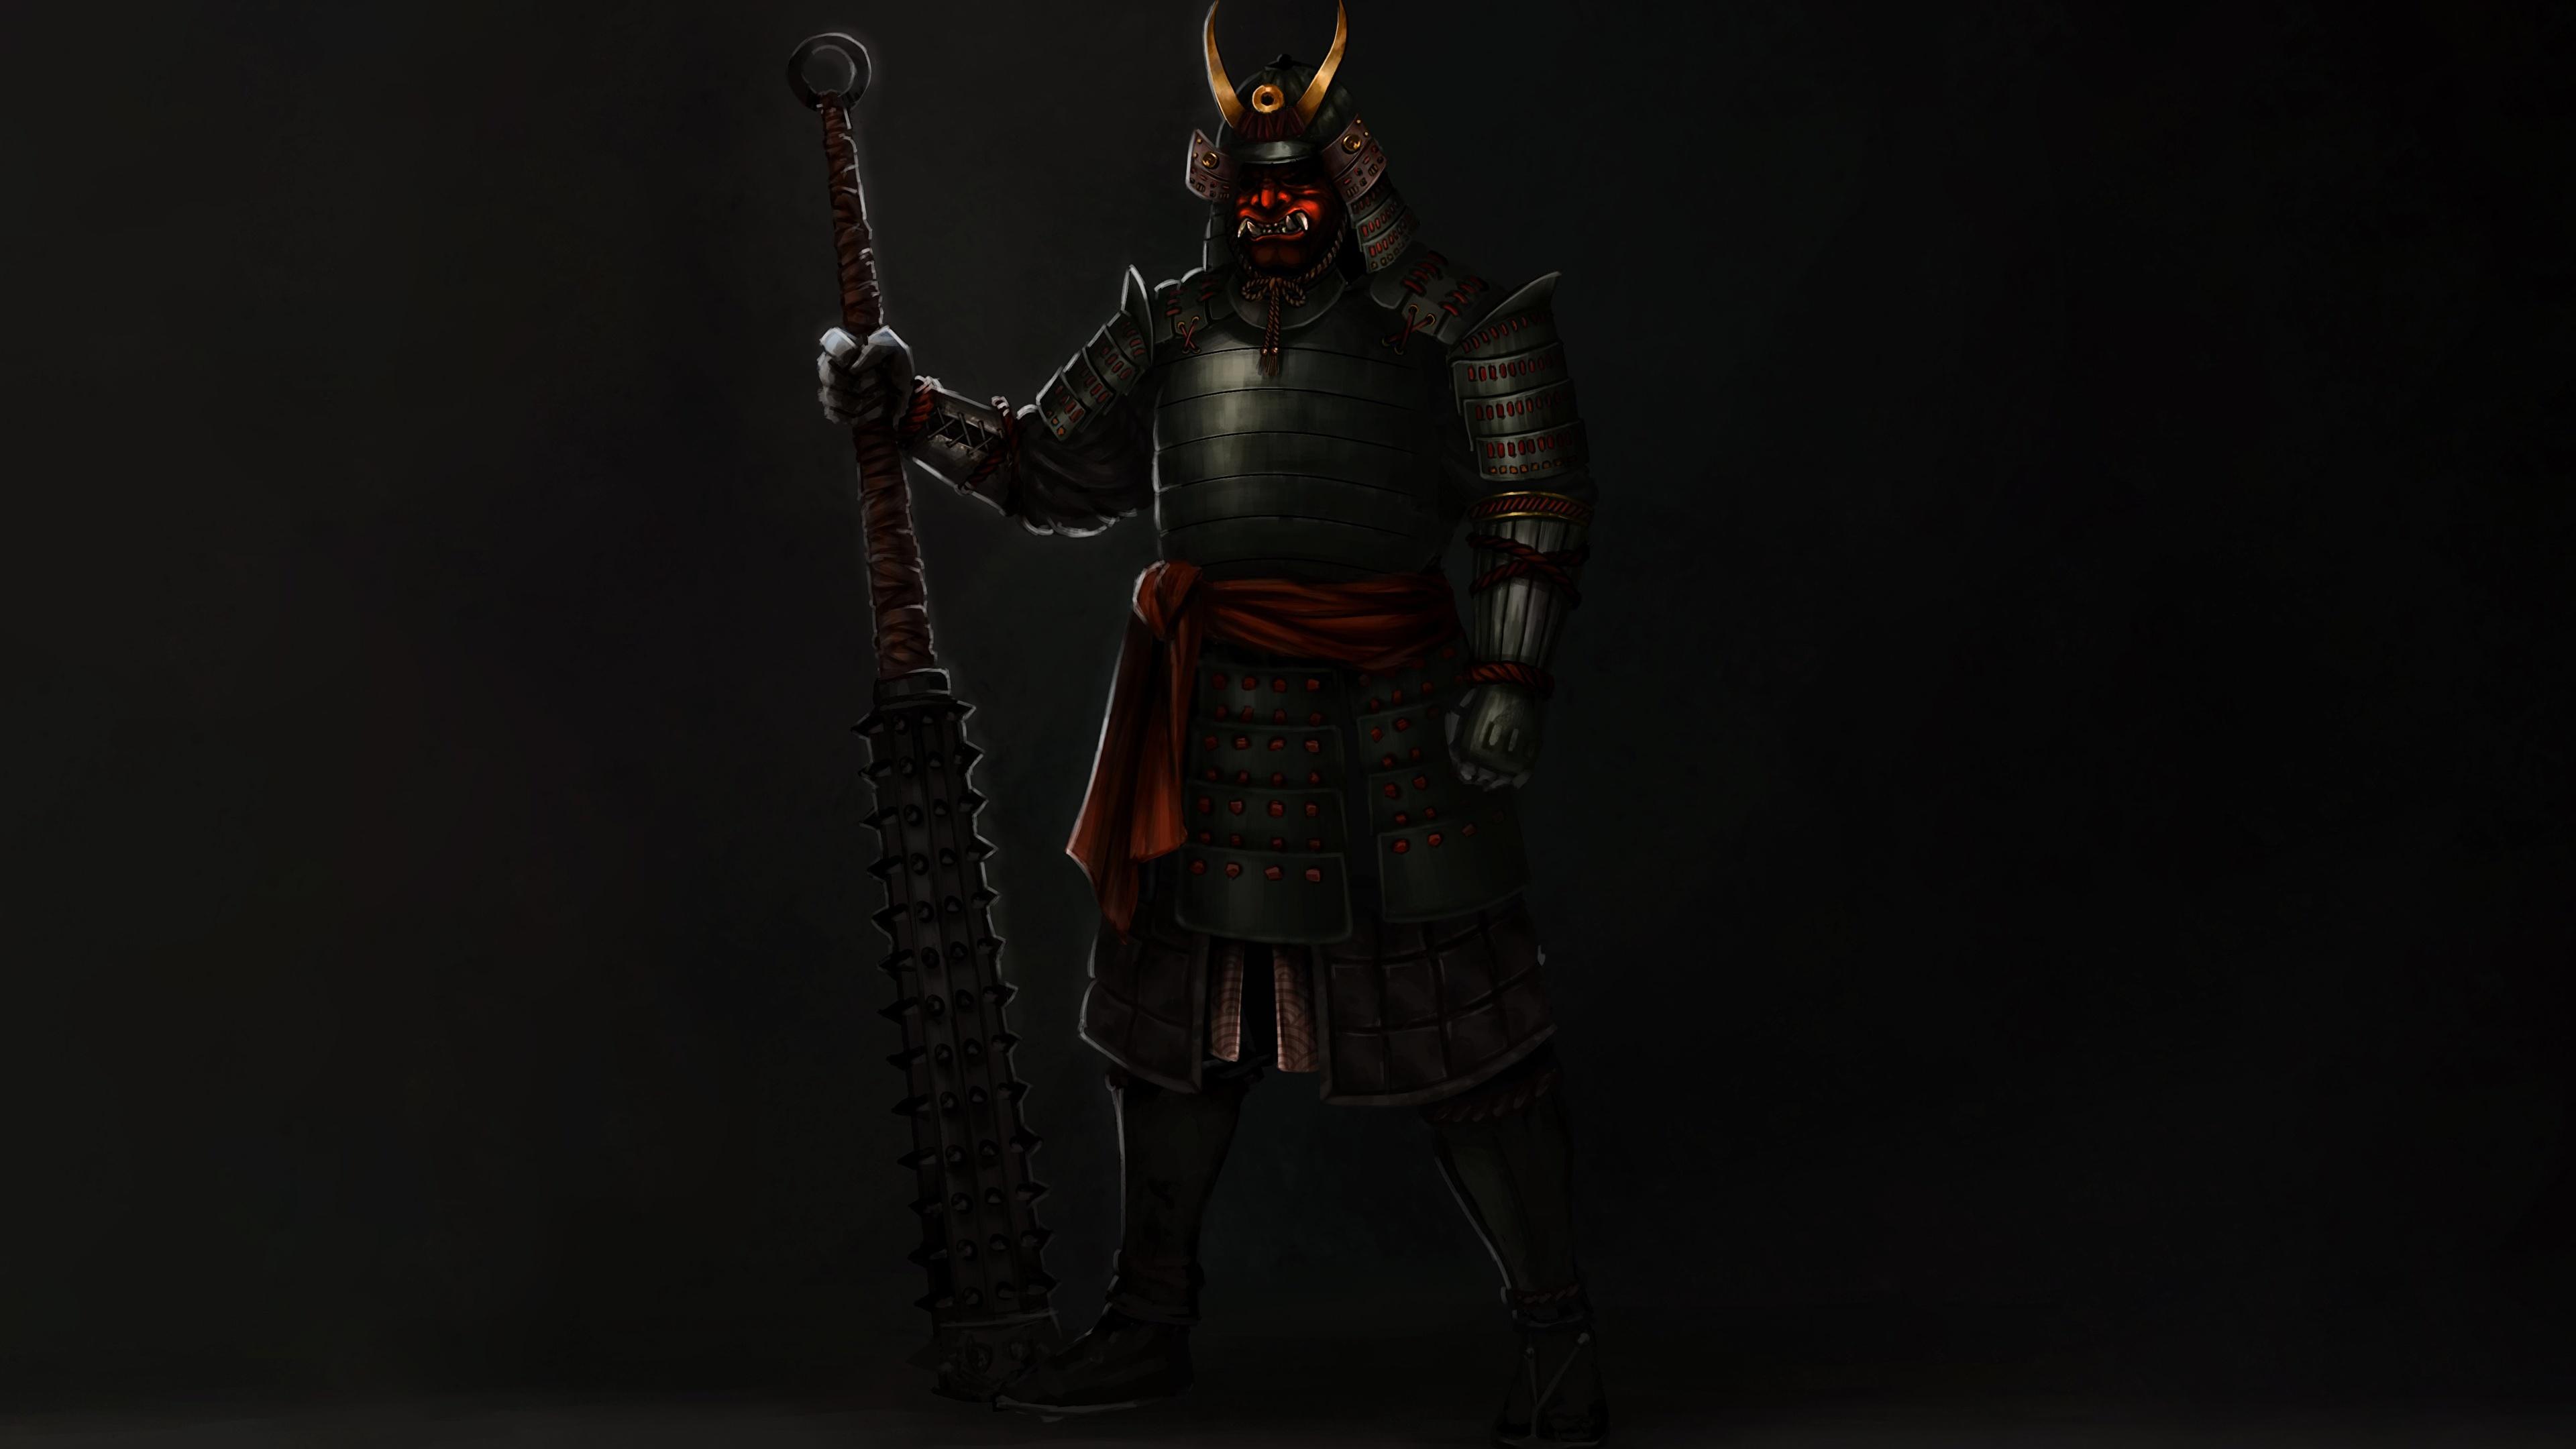 Pictures Armor Samurai Alejandro Castillejo Japanese 3840x2160